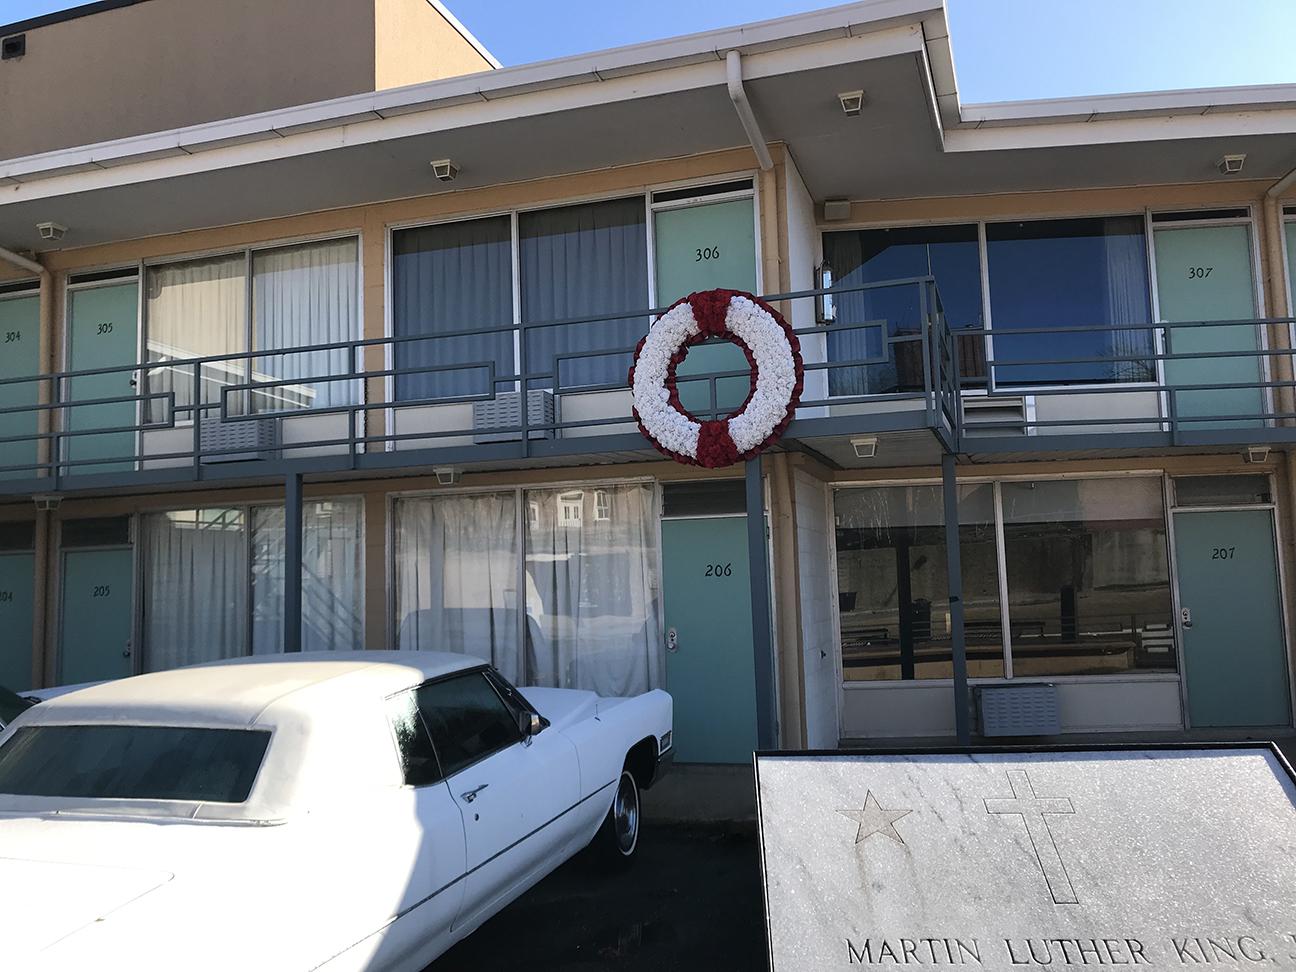 BalconyLorraineMotel